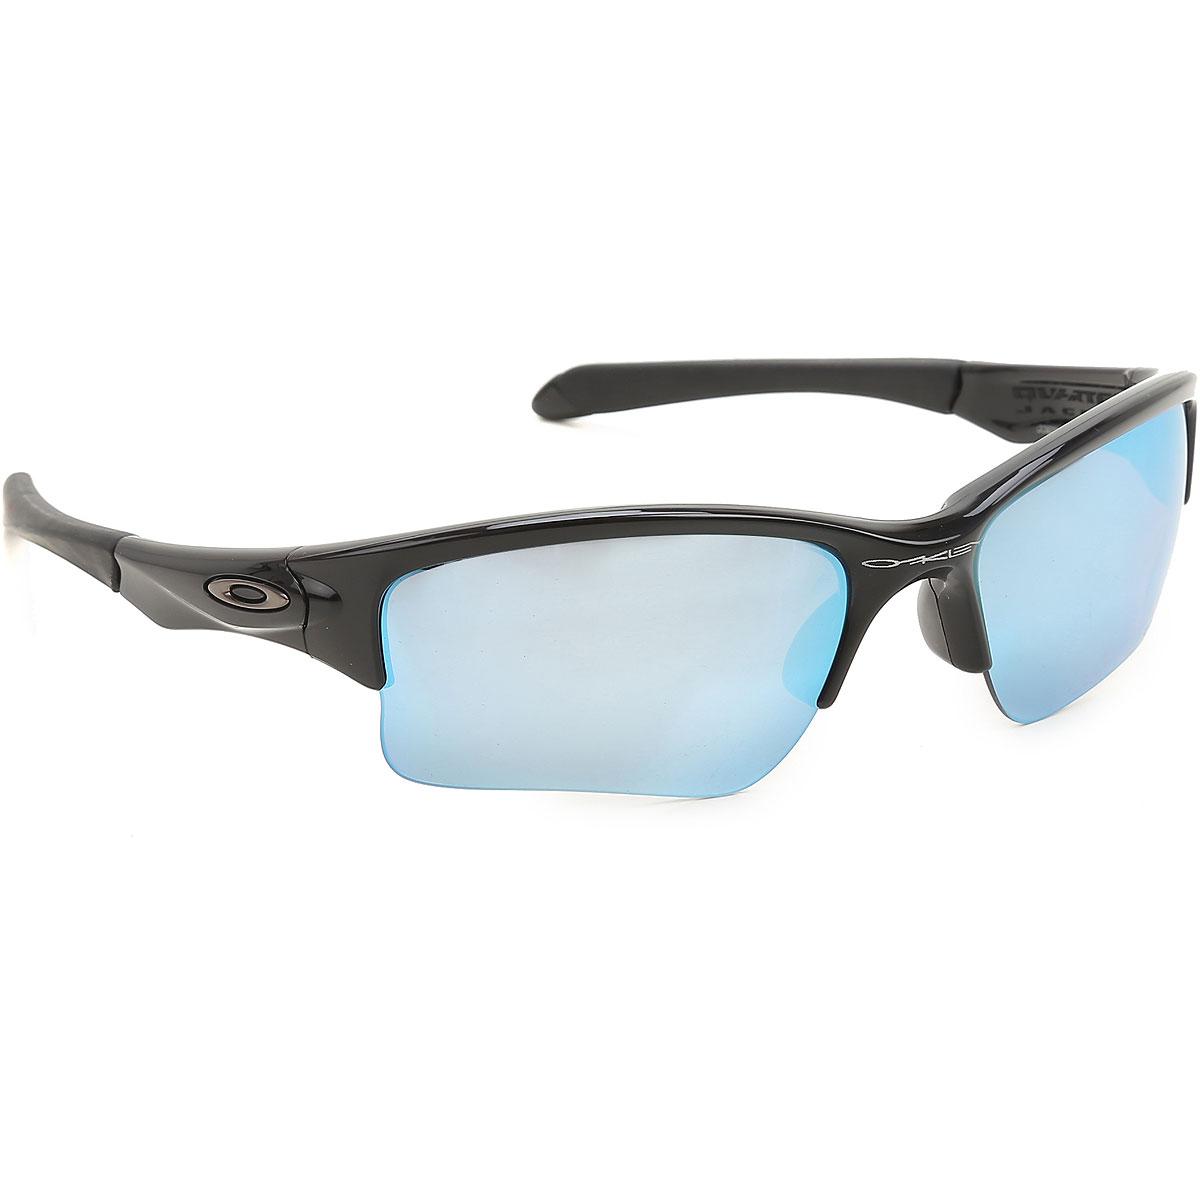 Oakley Kids Sunglasses for Boys On Sale in Outlet, Black, 2019